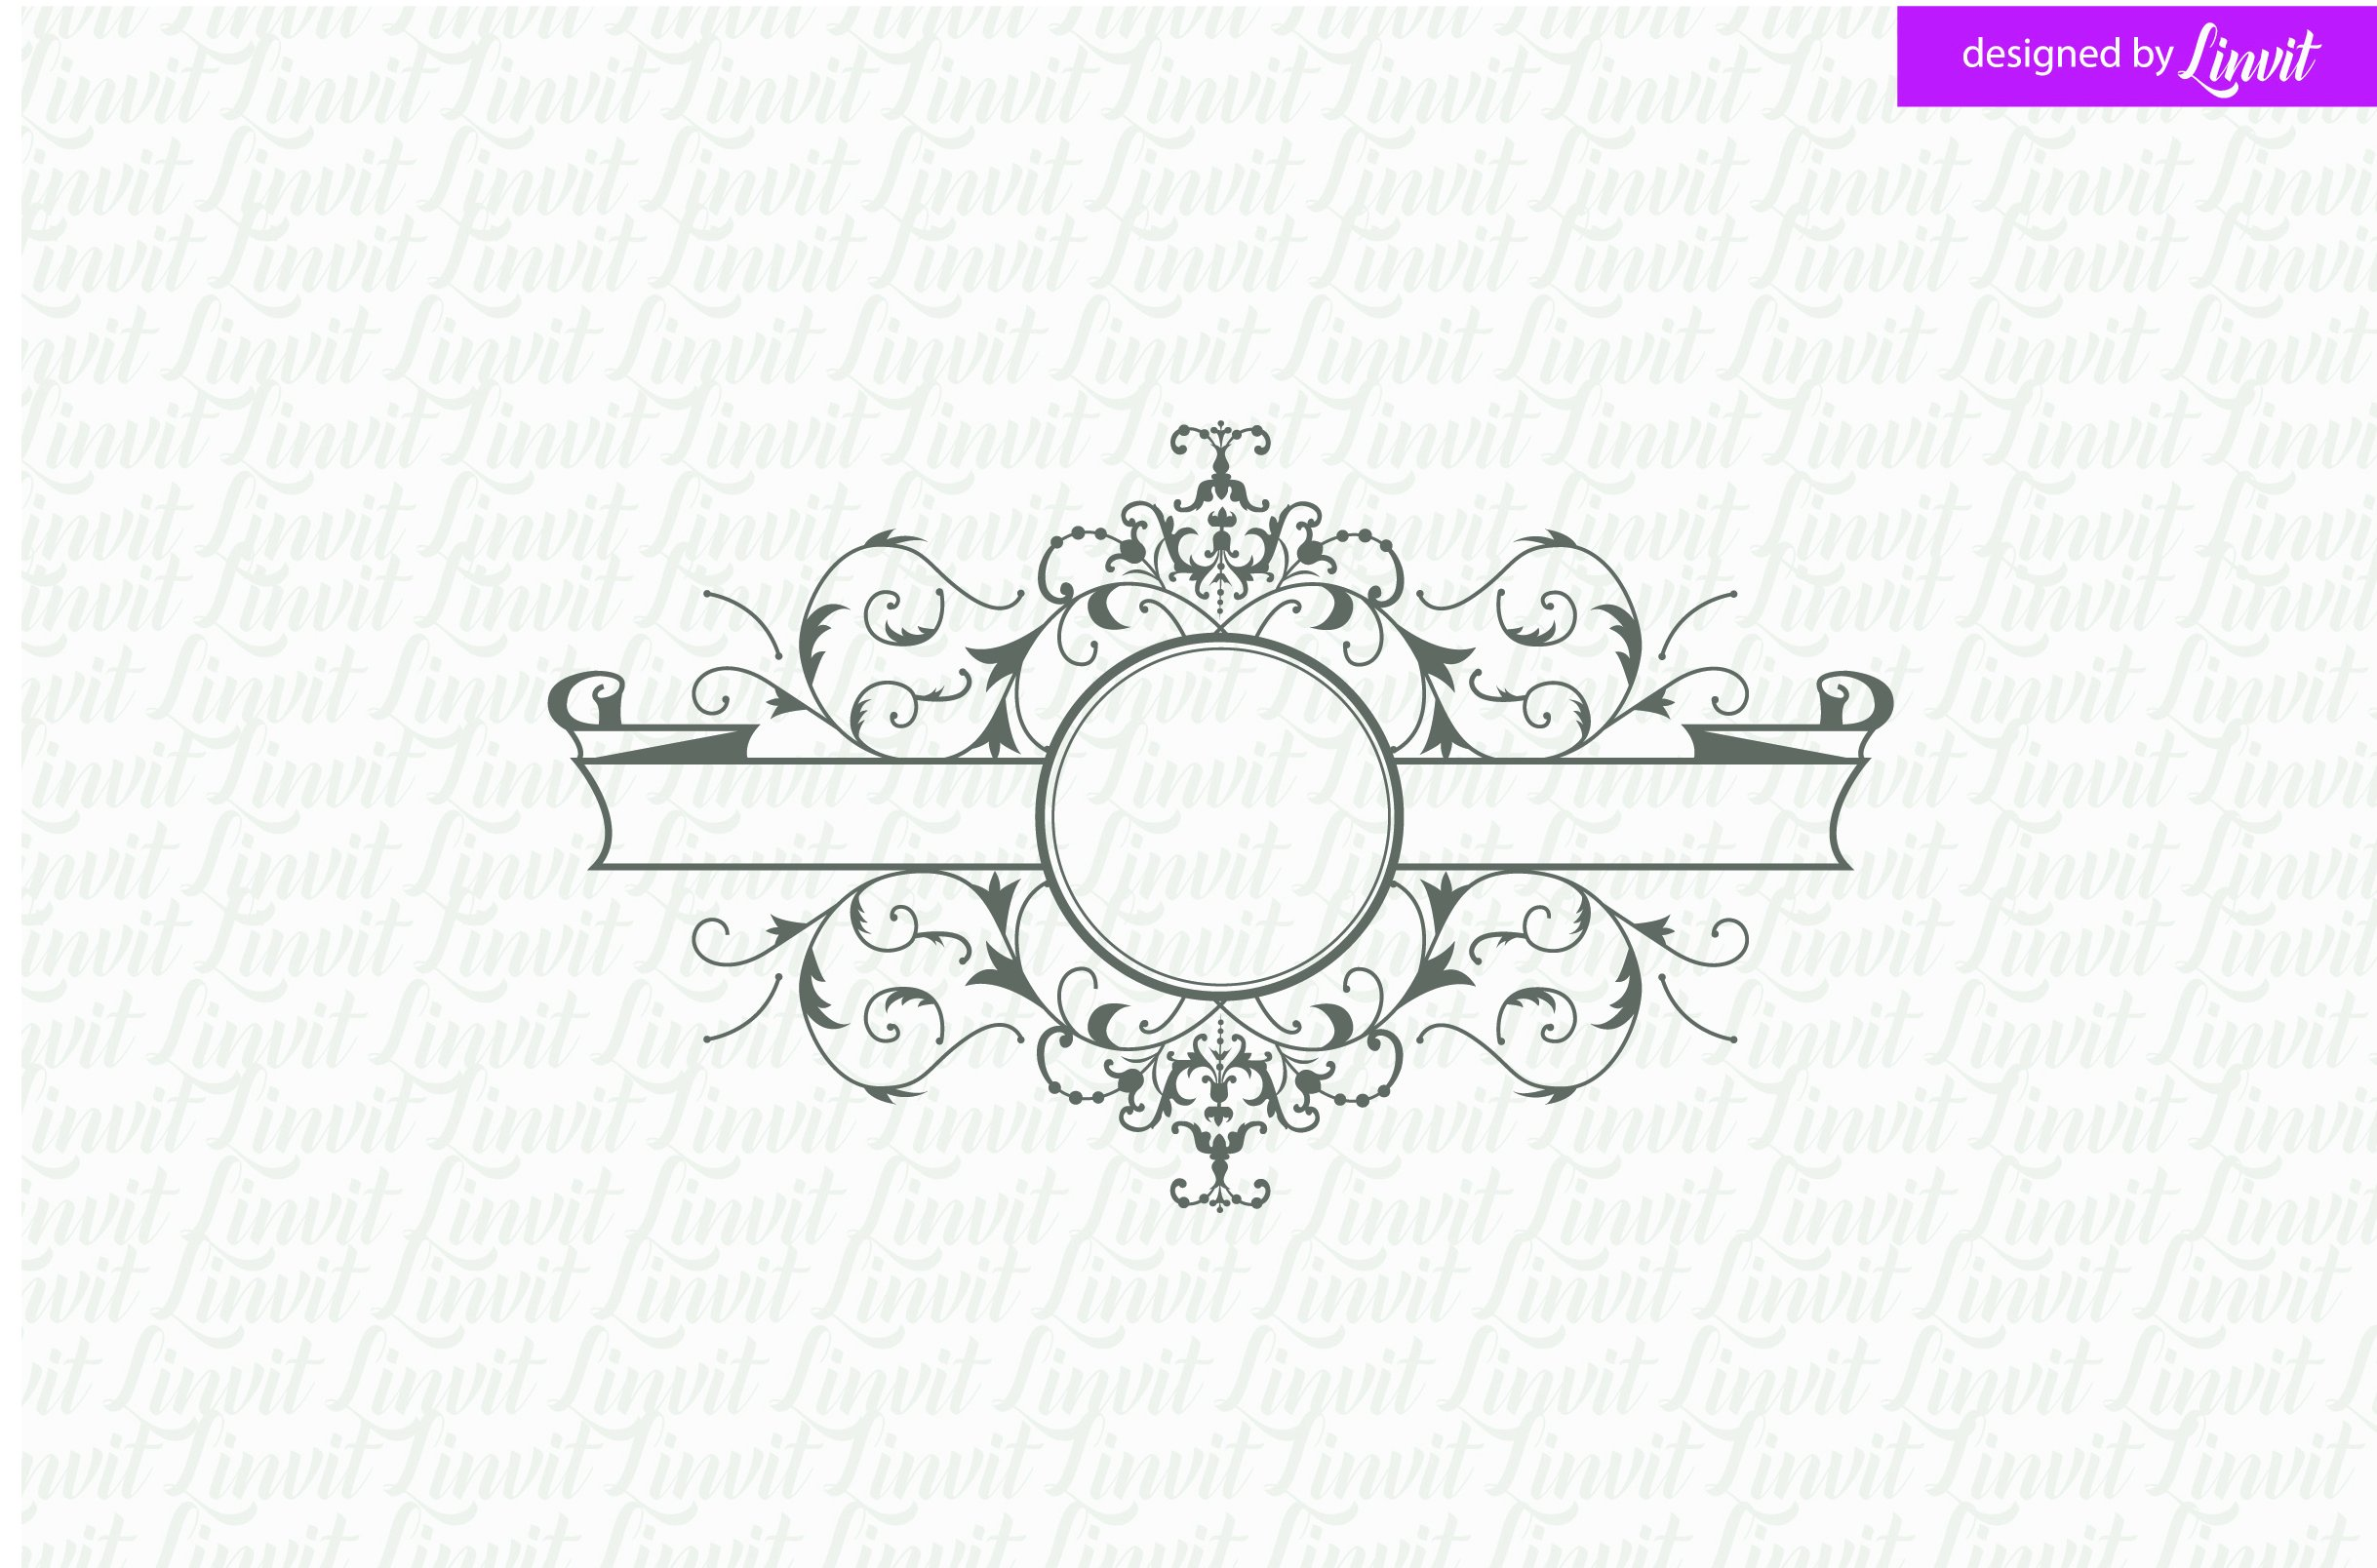 luxury royal wedding logo logo templates creative market. Black Bedroom Furniture Sets. Home Design Ideas